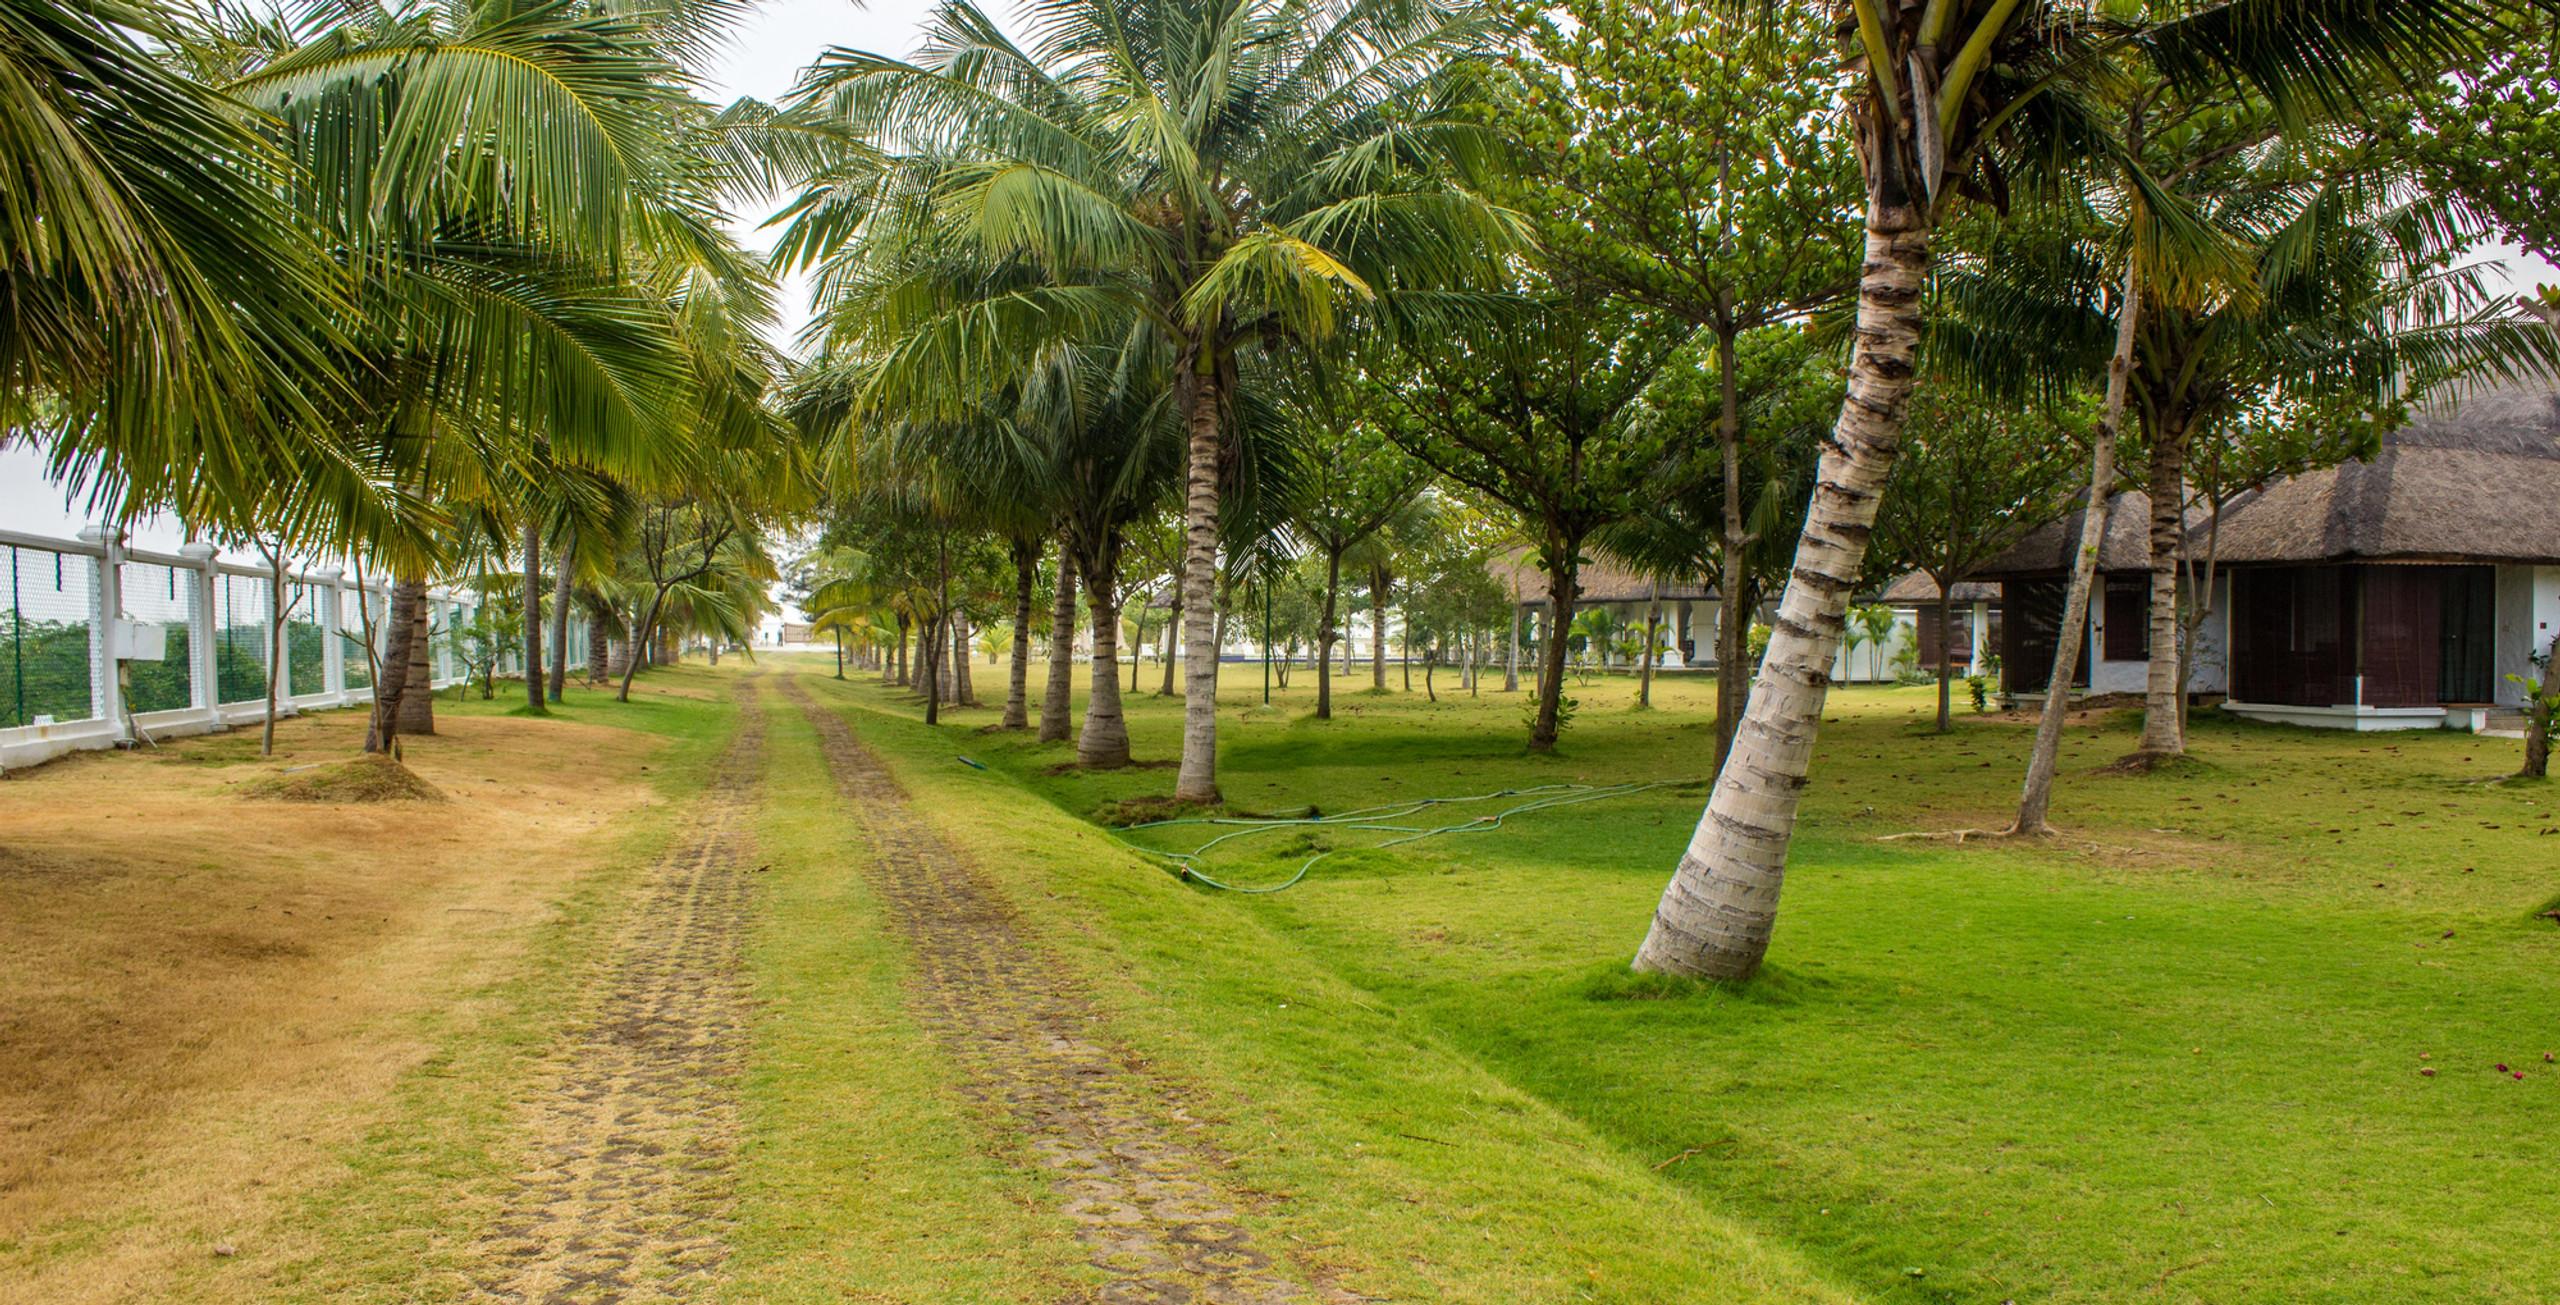 Landscaping_Le Pondy_Fairytale Travel Blog (5)